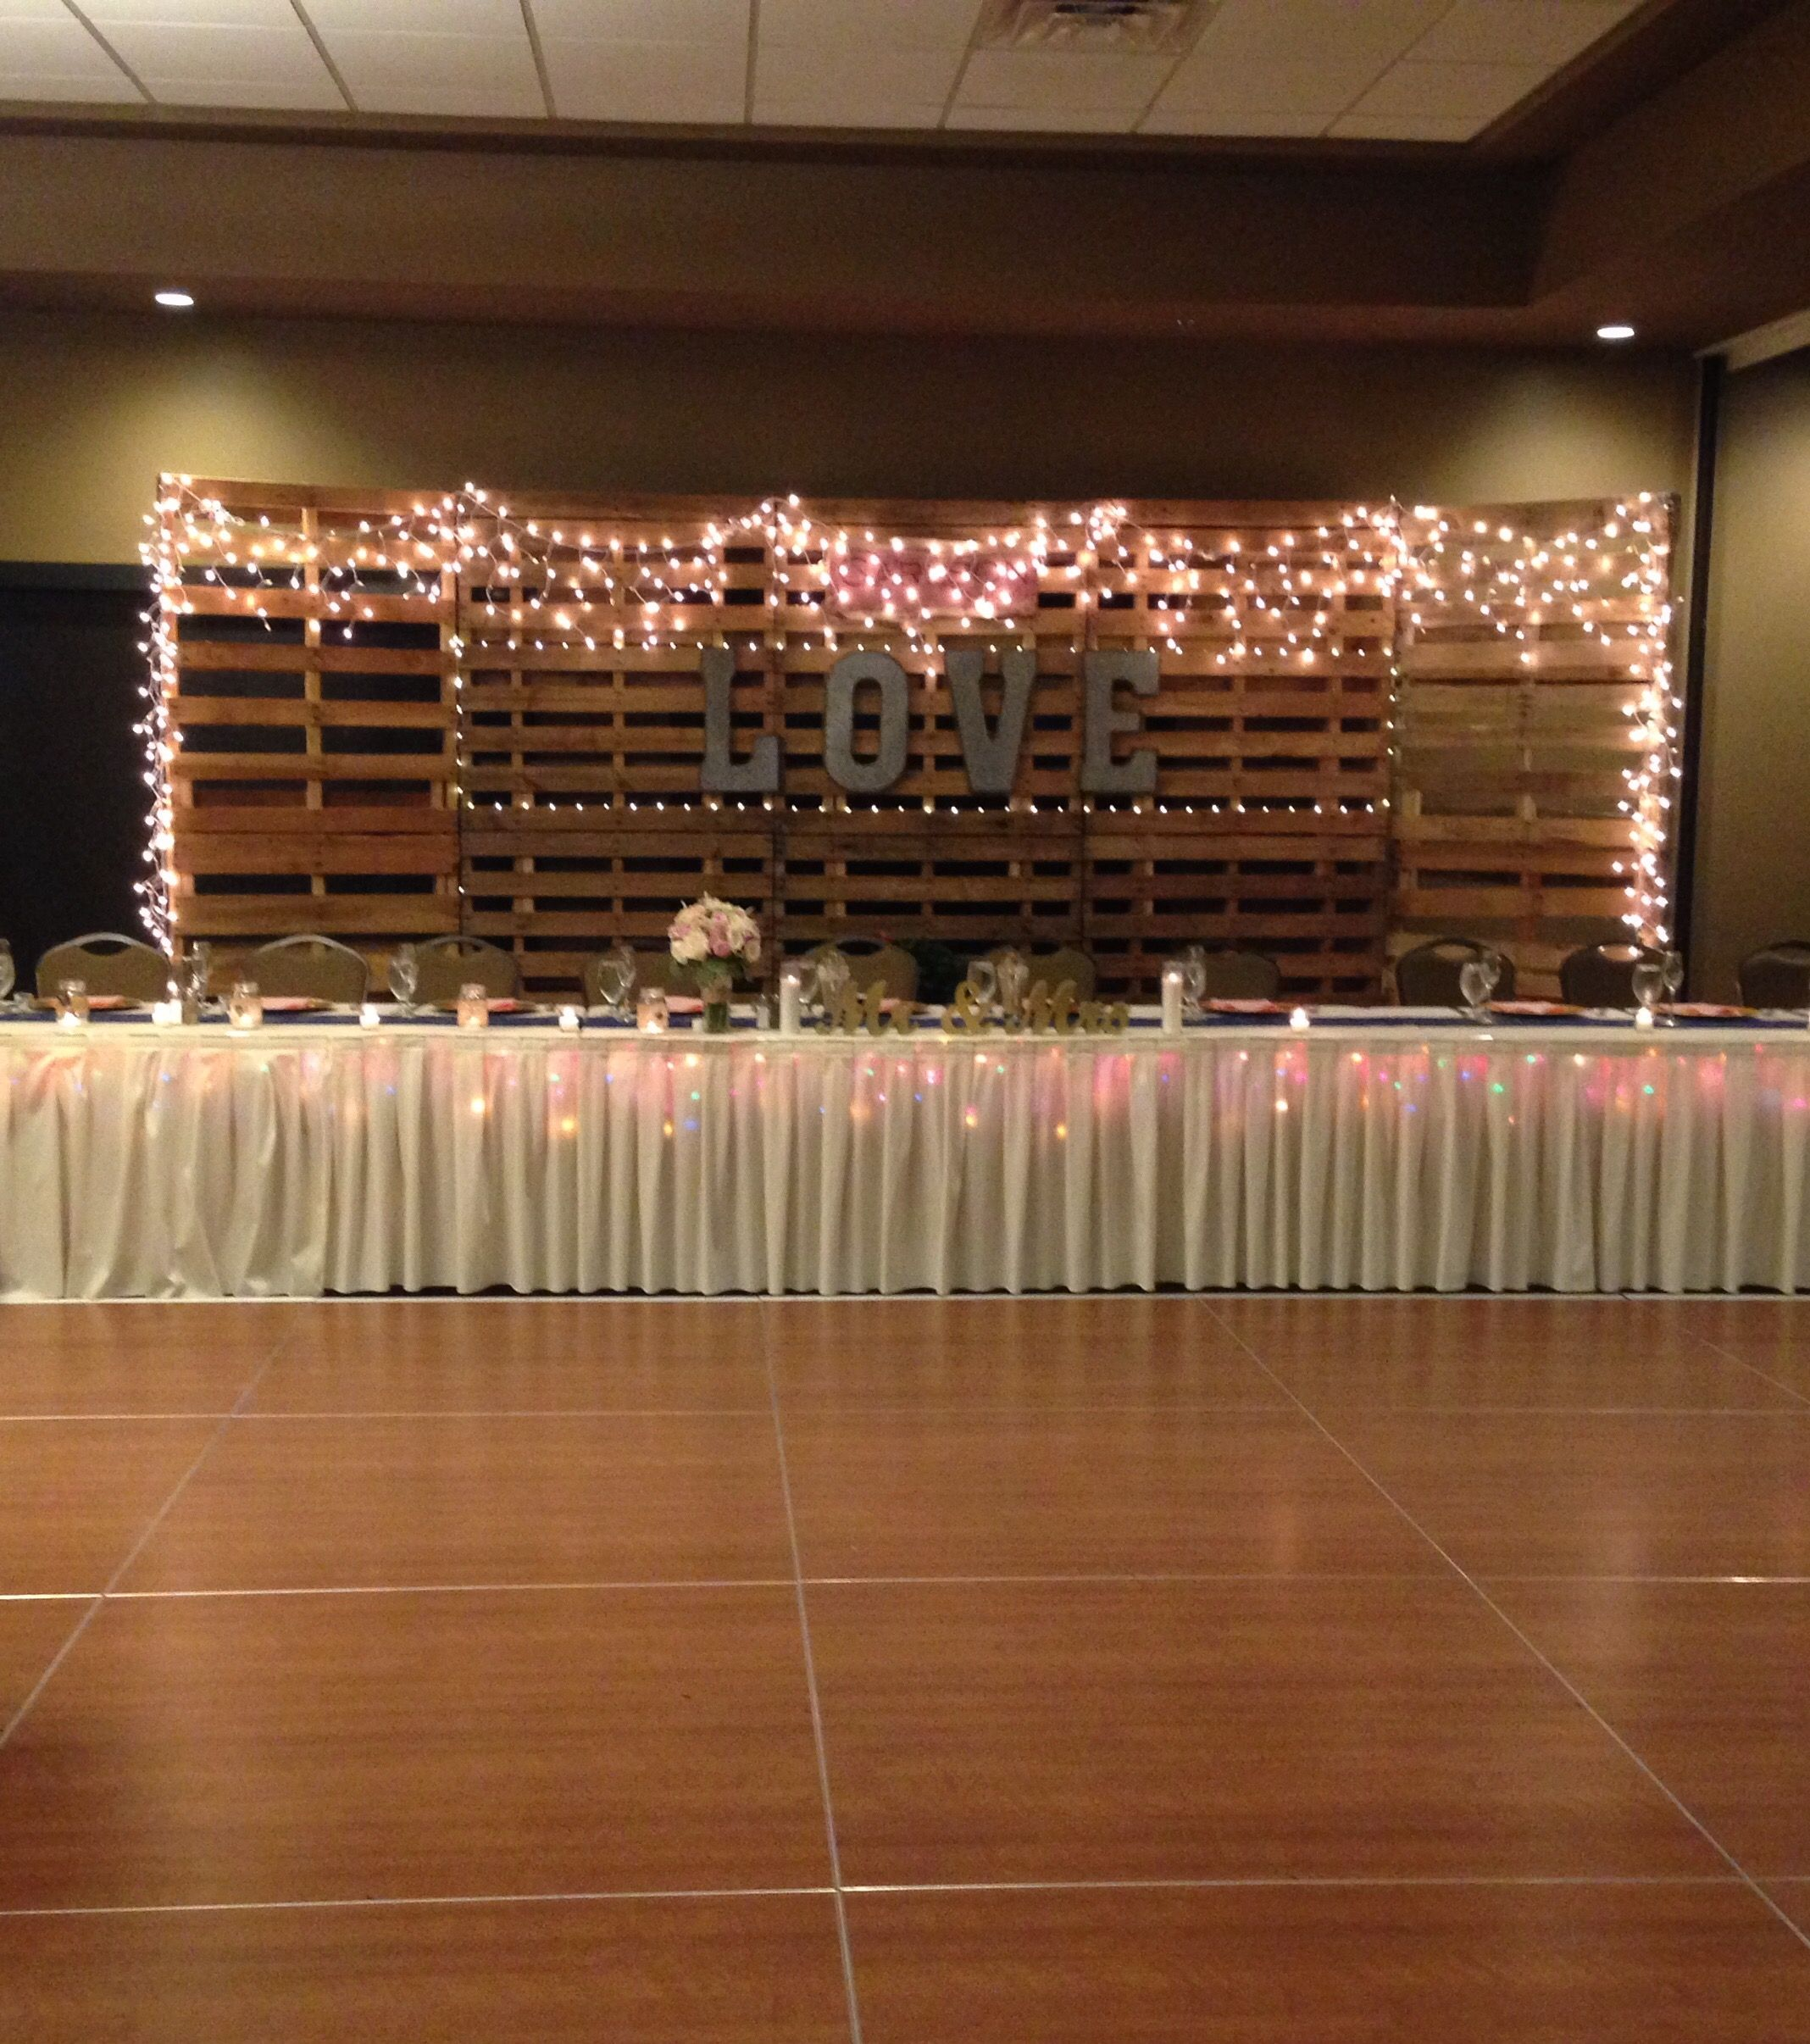 Wedding Reception Head Table Ideas: Rustic Backdrop For The Head Table. #bigBRUKENdeal